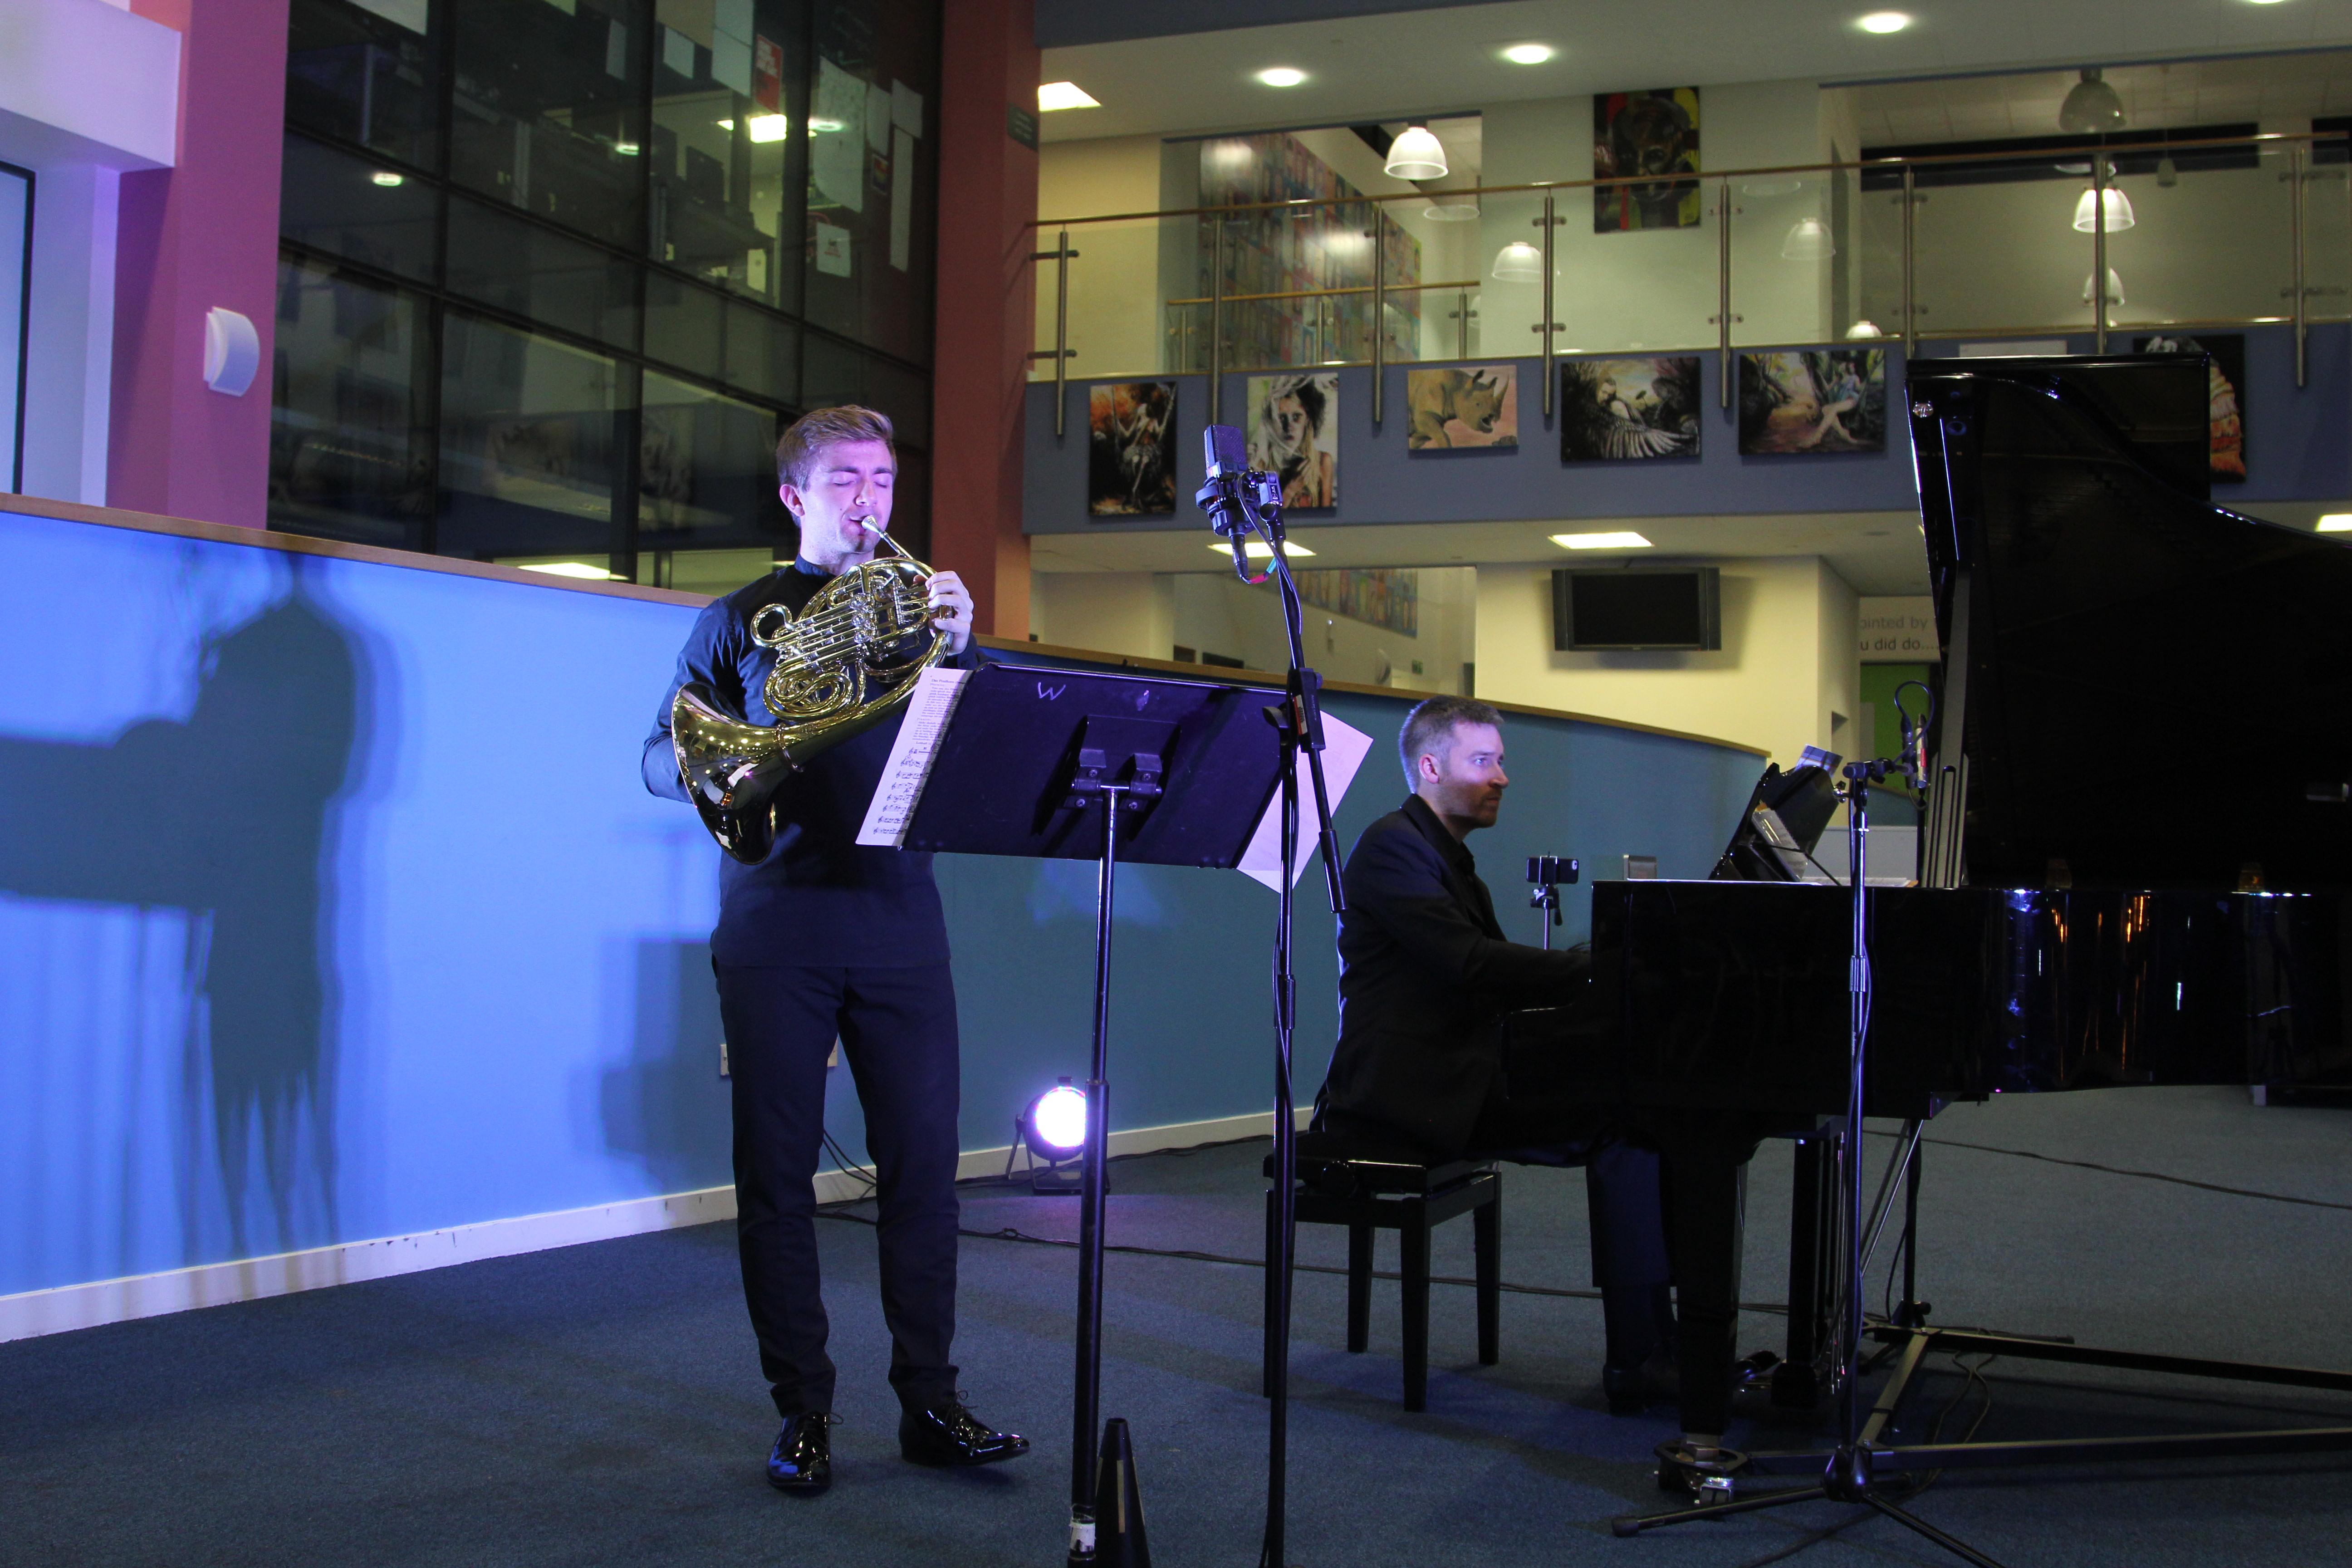 Ben Goldscheider and Richard Uttley perform at Writhlington School